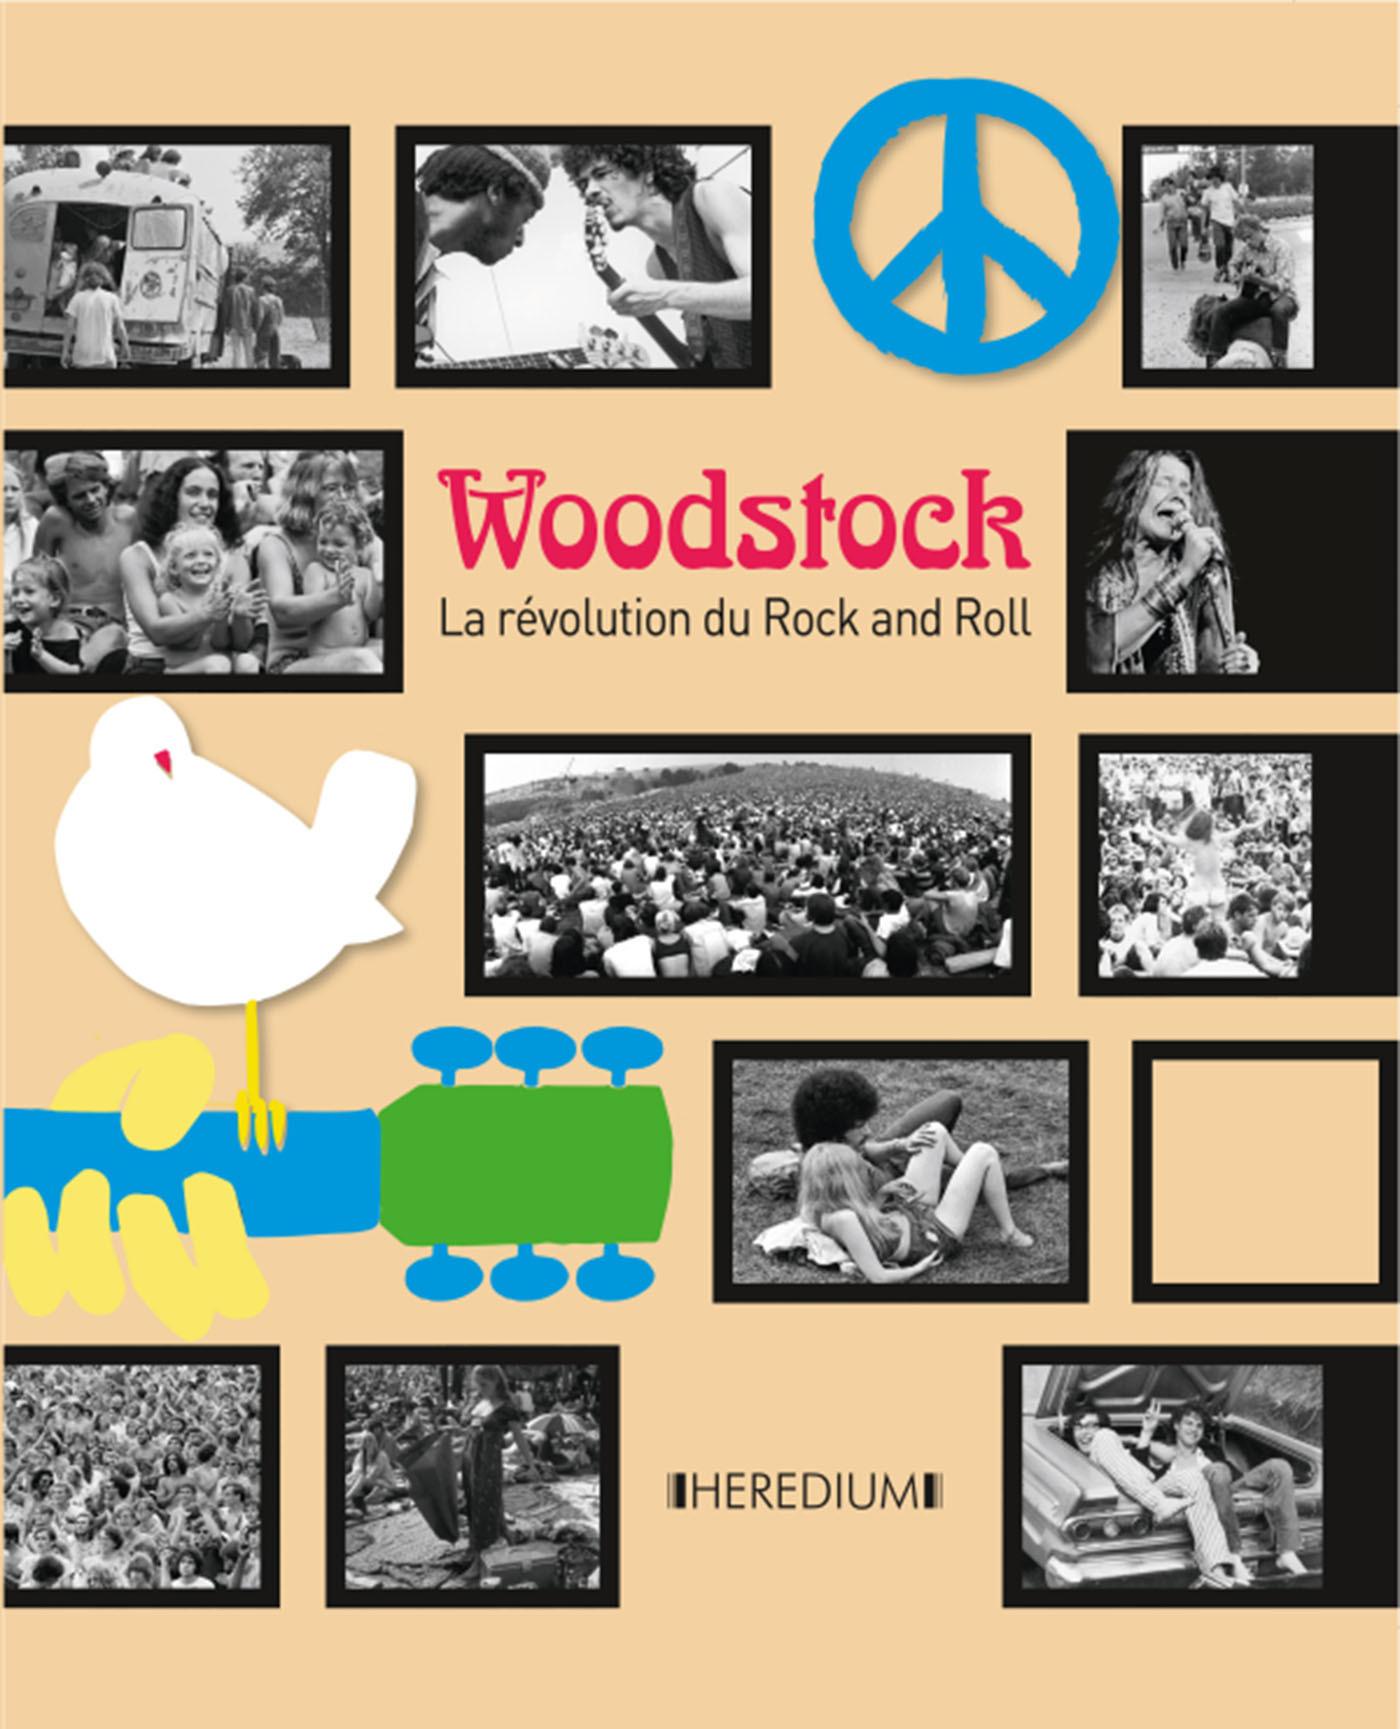 WOODSTOCK - LA REVOLUTION DU ROCK AND ROLL